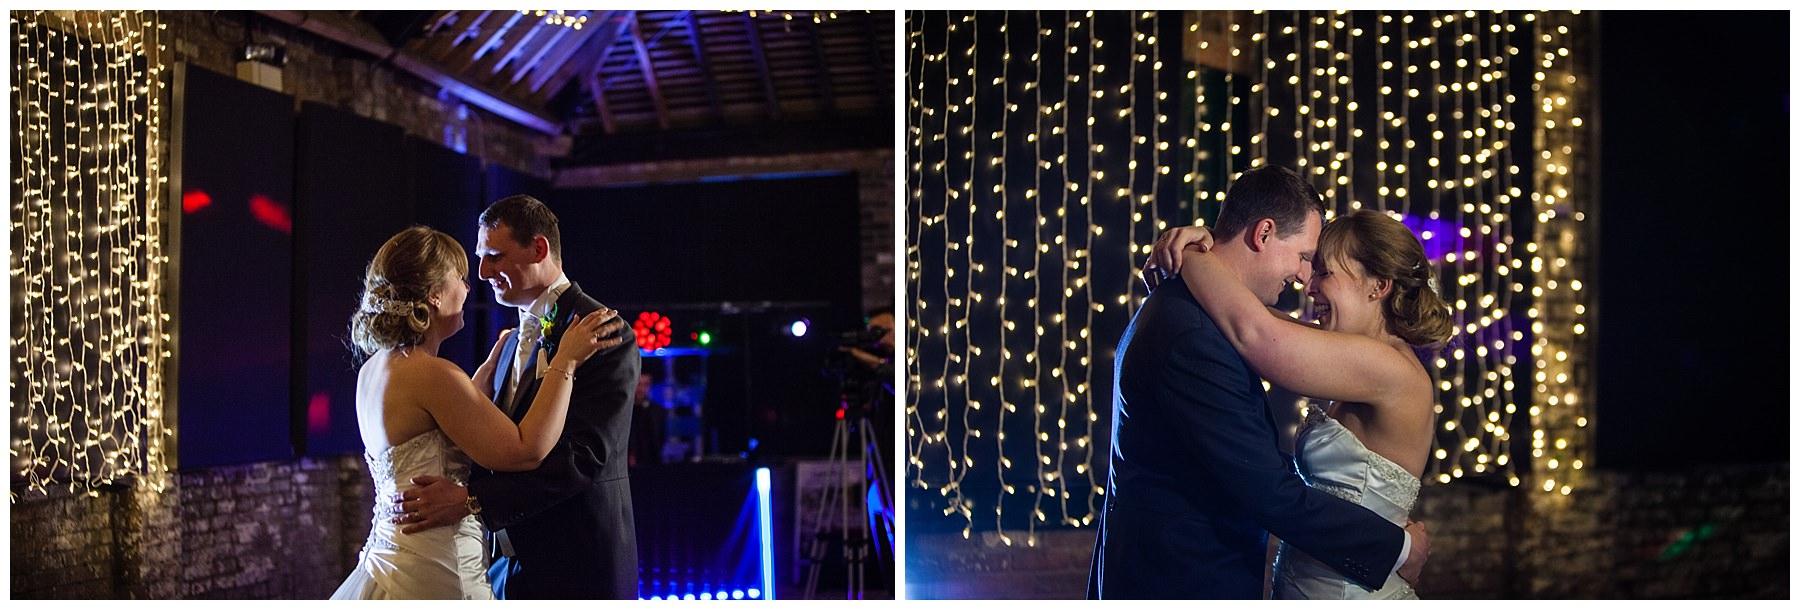 first dance at ironbridge wedding, shropshire wedding photographer